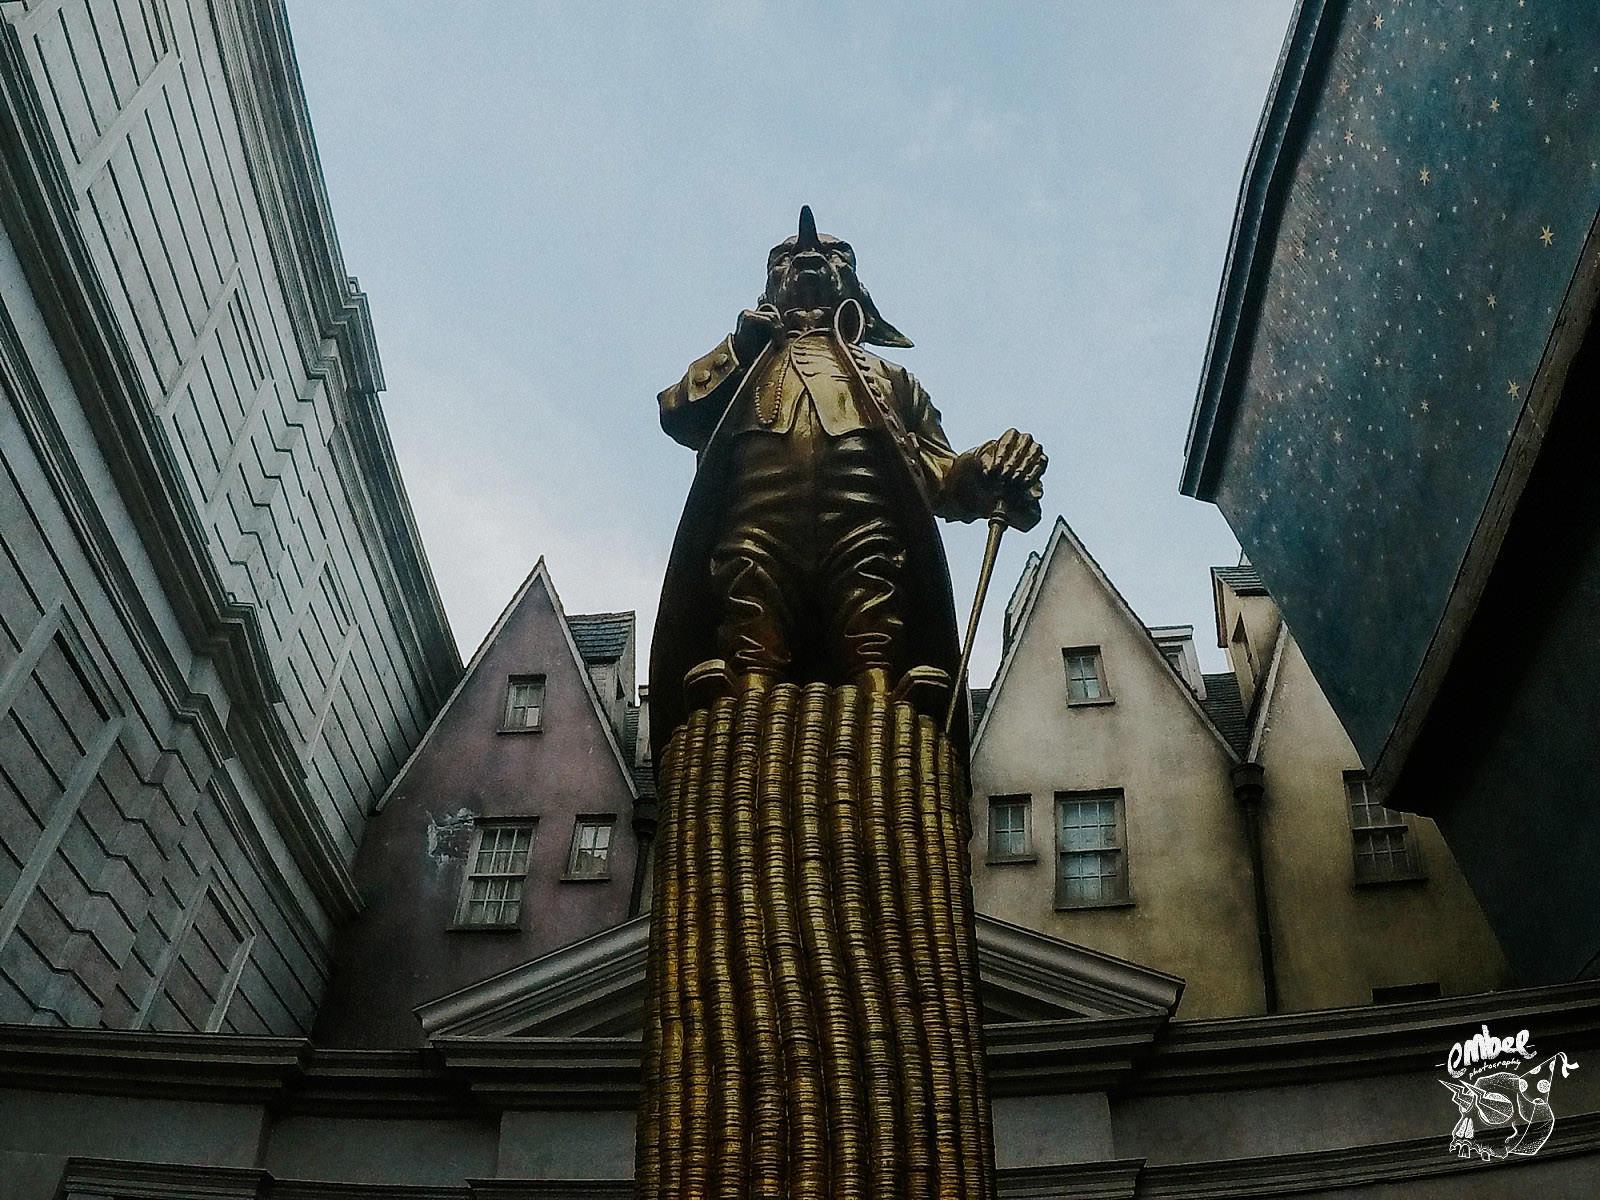 gringots gold goblin in universal studios